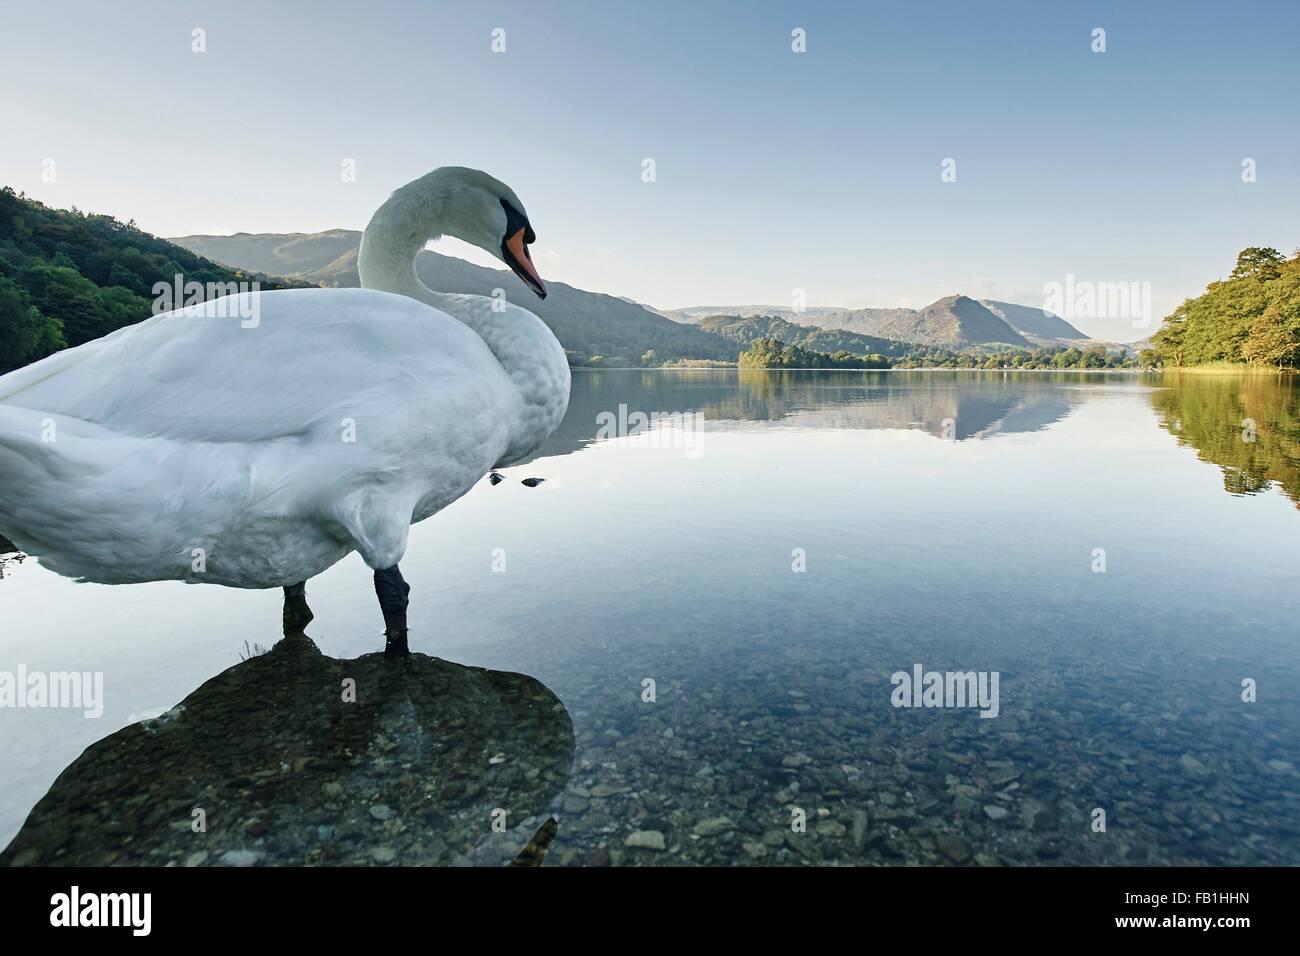 Swan in Grasmere Lake, Grasmere, Cumbria, UK - Stock Image